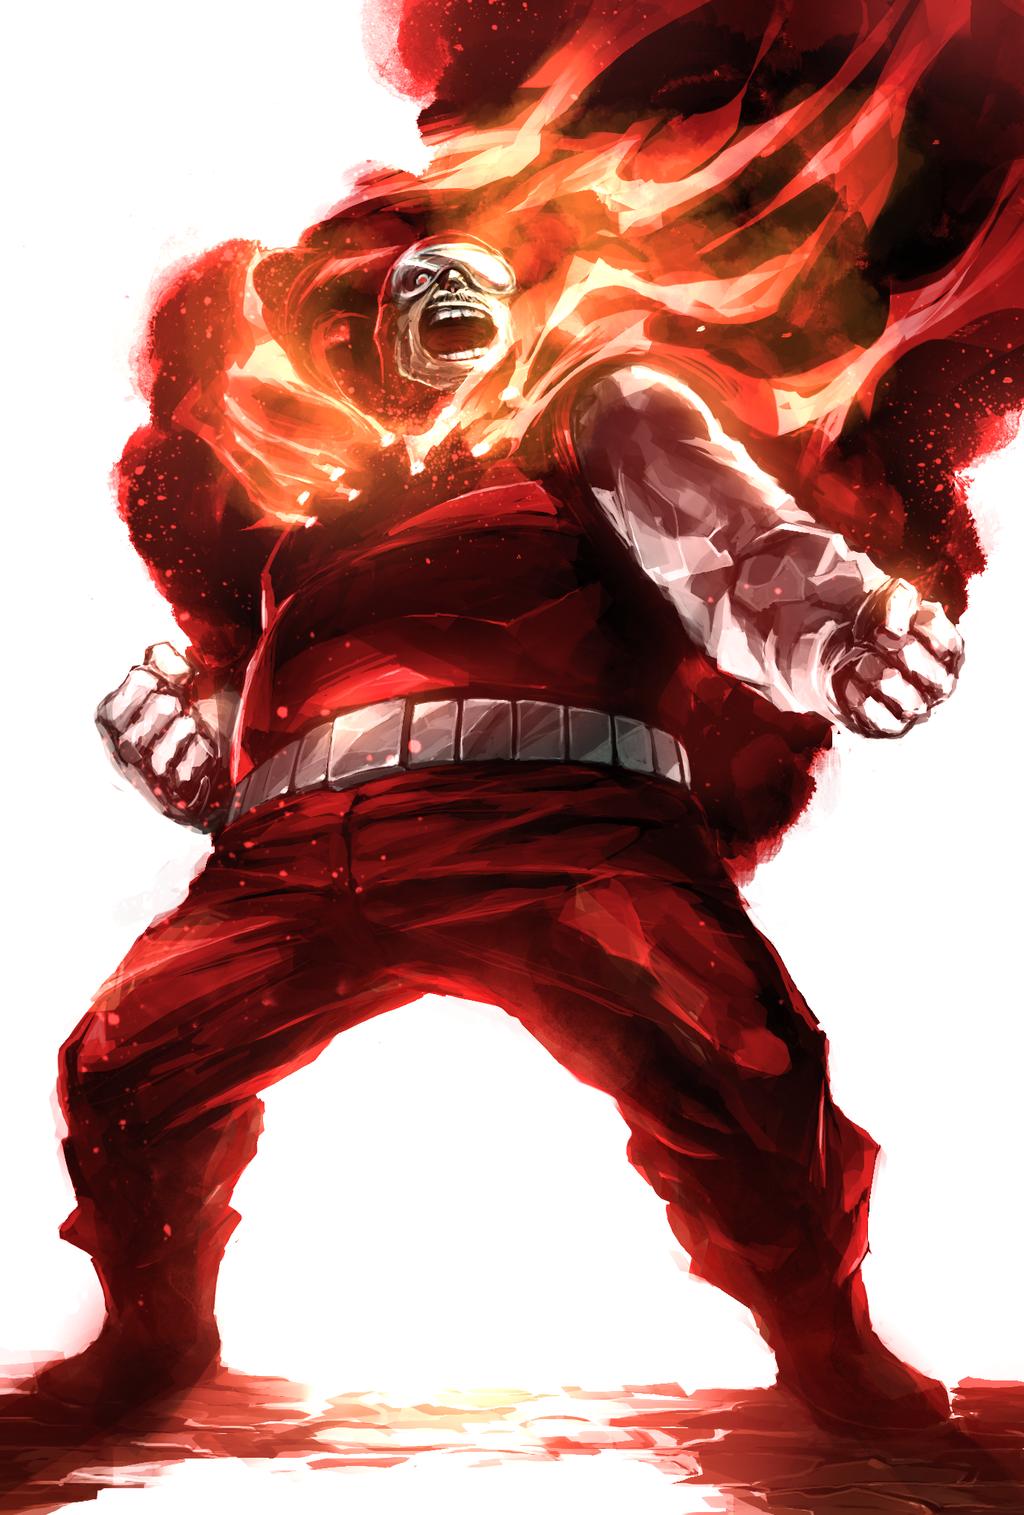 Human Flame by naratani.deviantart.com on @DeviantArt